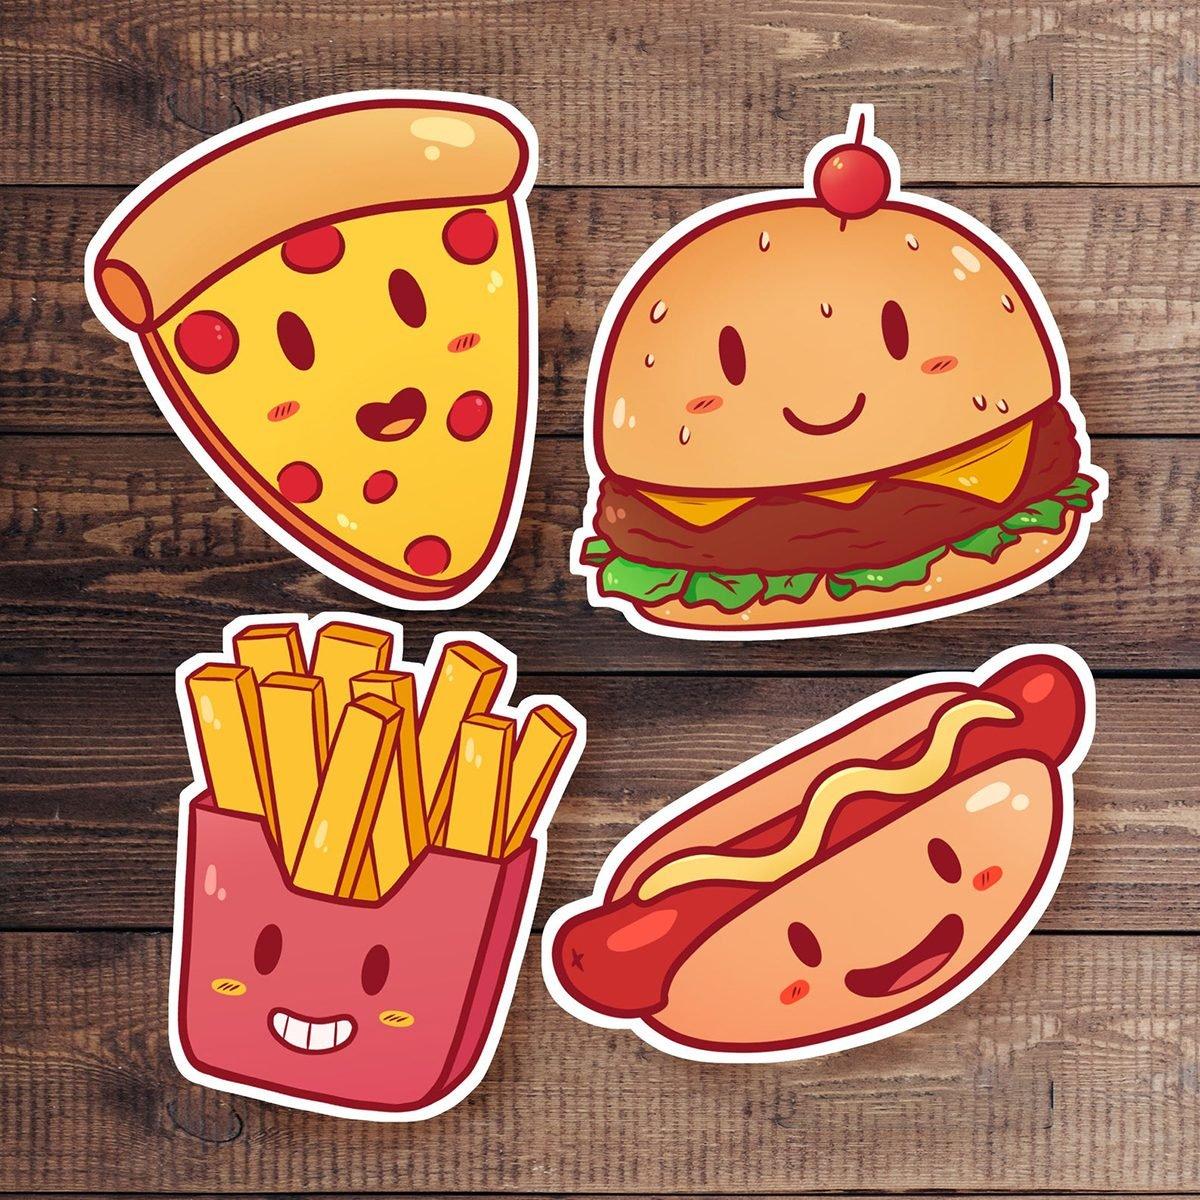 Cute Fast Food Sticker Set | Cute stickers - Pizza - French Fries - Hamburger - Hotdog